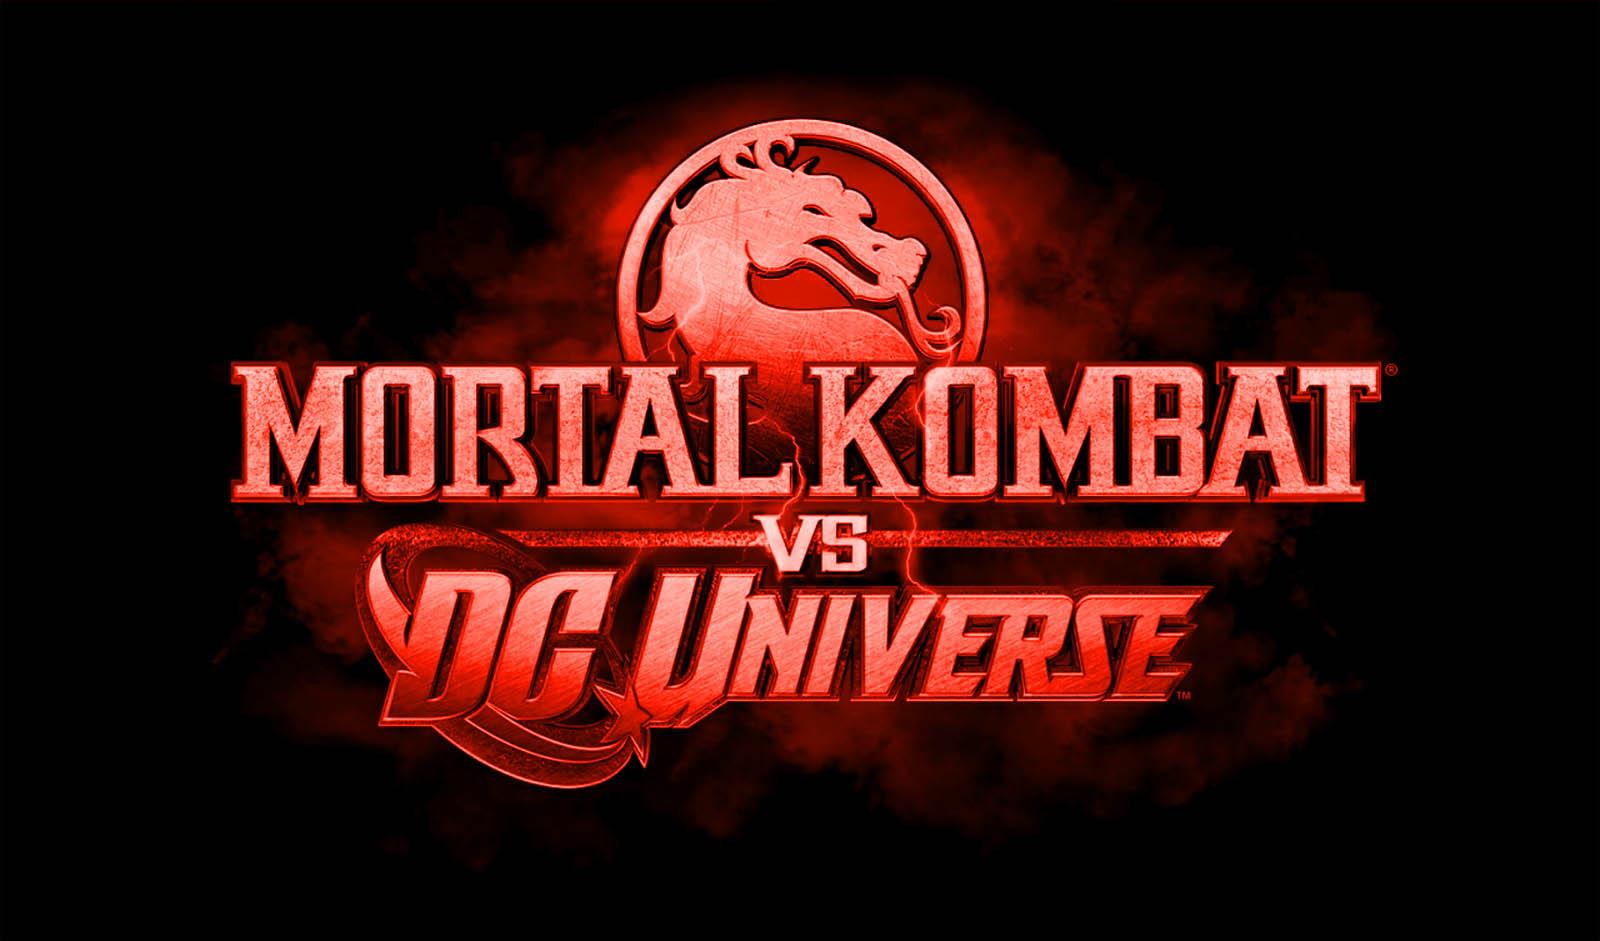 http://3.bp.blogspot.com/-wTW36qKvggM/TnXo9f2xQ1I/AAAAAAAADHg/UPX4NhNXzrE/s1600/Mortal_Combat_vs_DC_Universe_Logo_HD_Wallpaper_Vvallpaper.NET.jpg